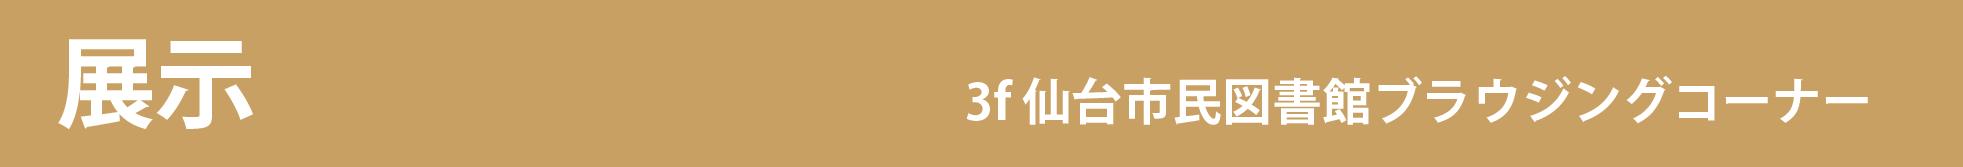 exhibition3f